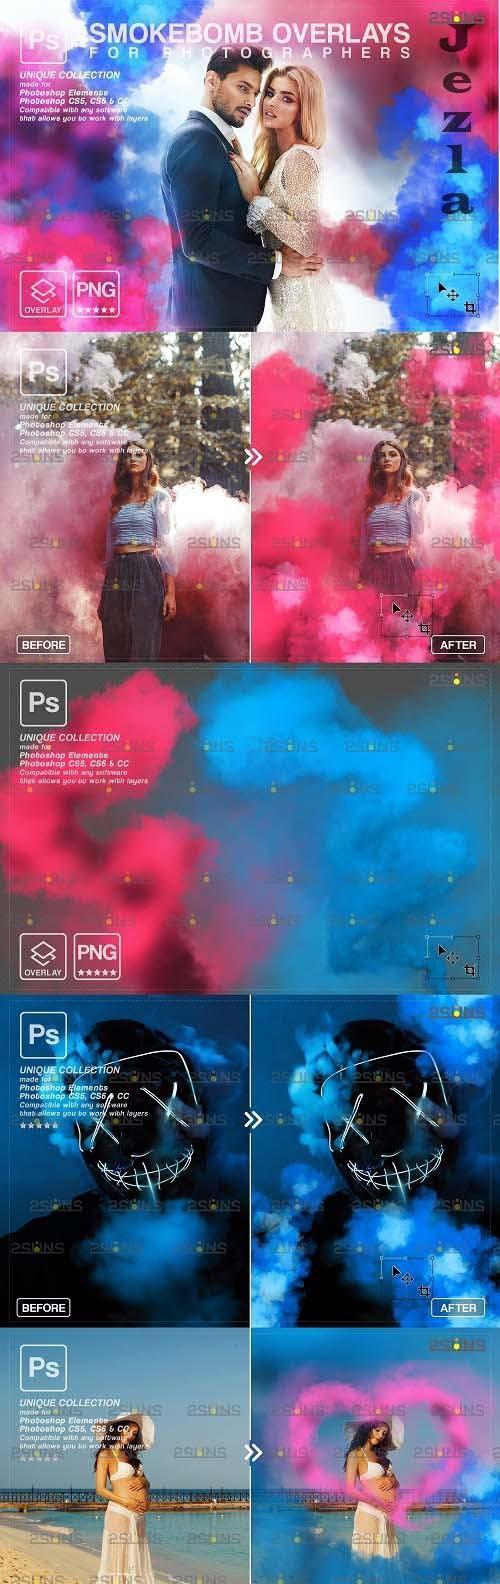 Gender reveal smoke photoshop overlay & Pink smoke bomb V2 - 1612665